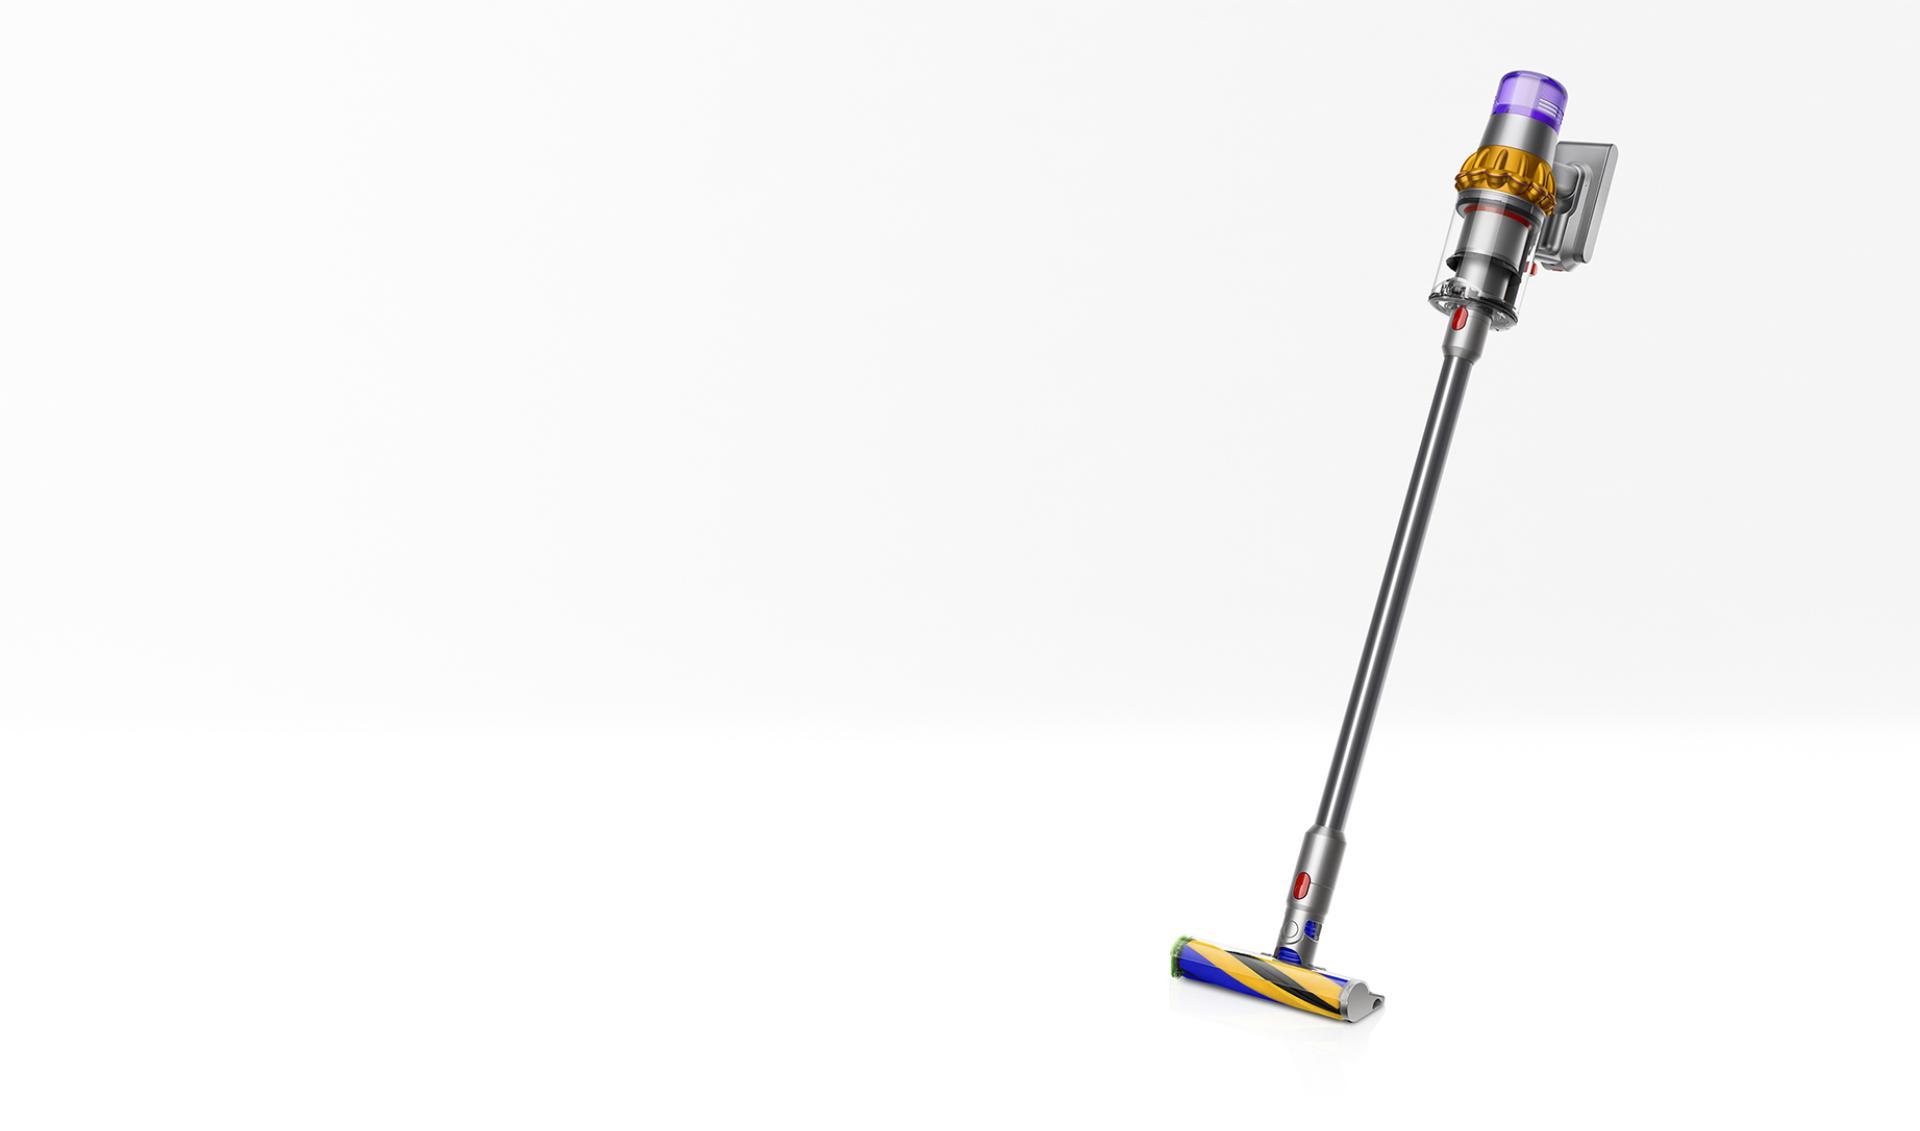 Dyson V15 Detect vacuum